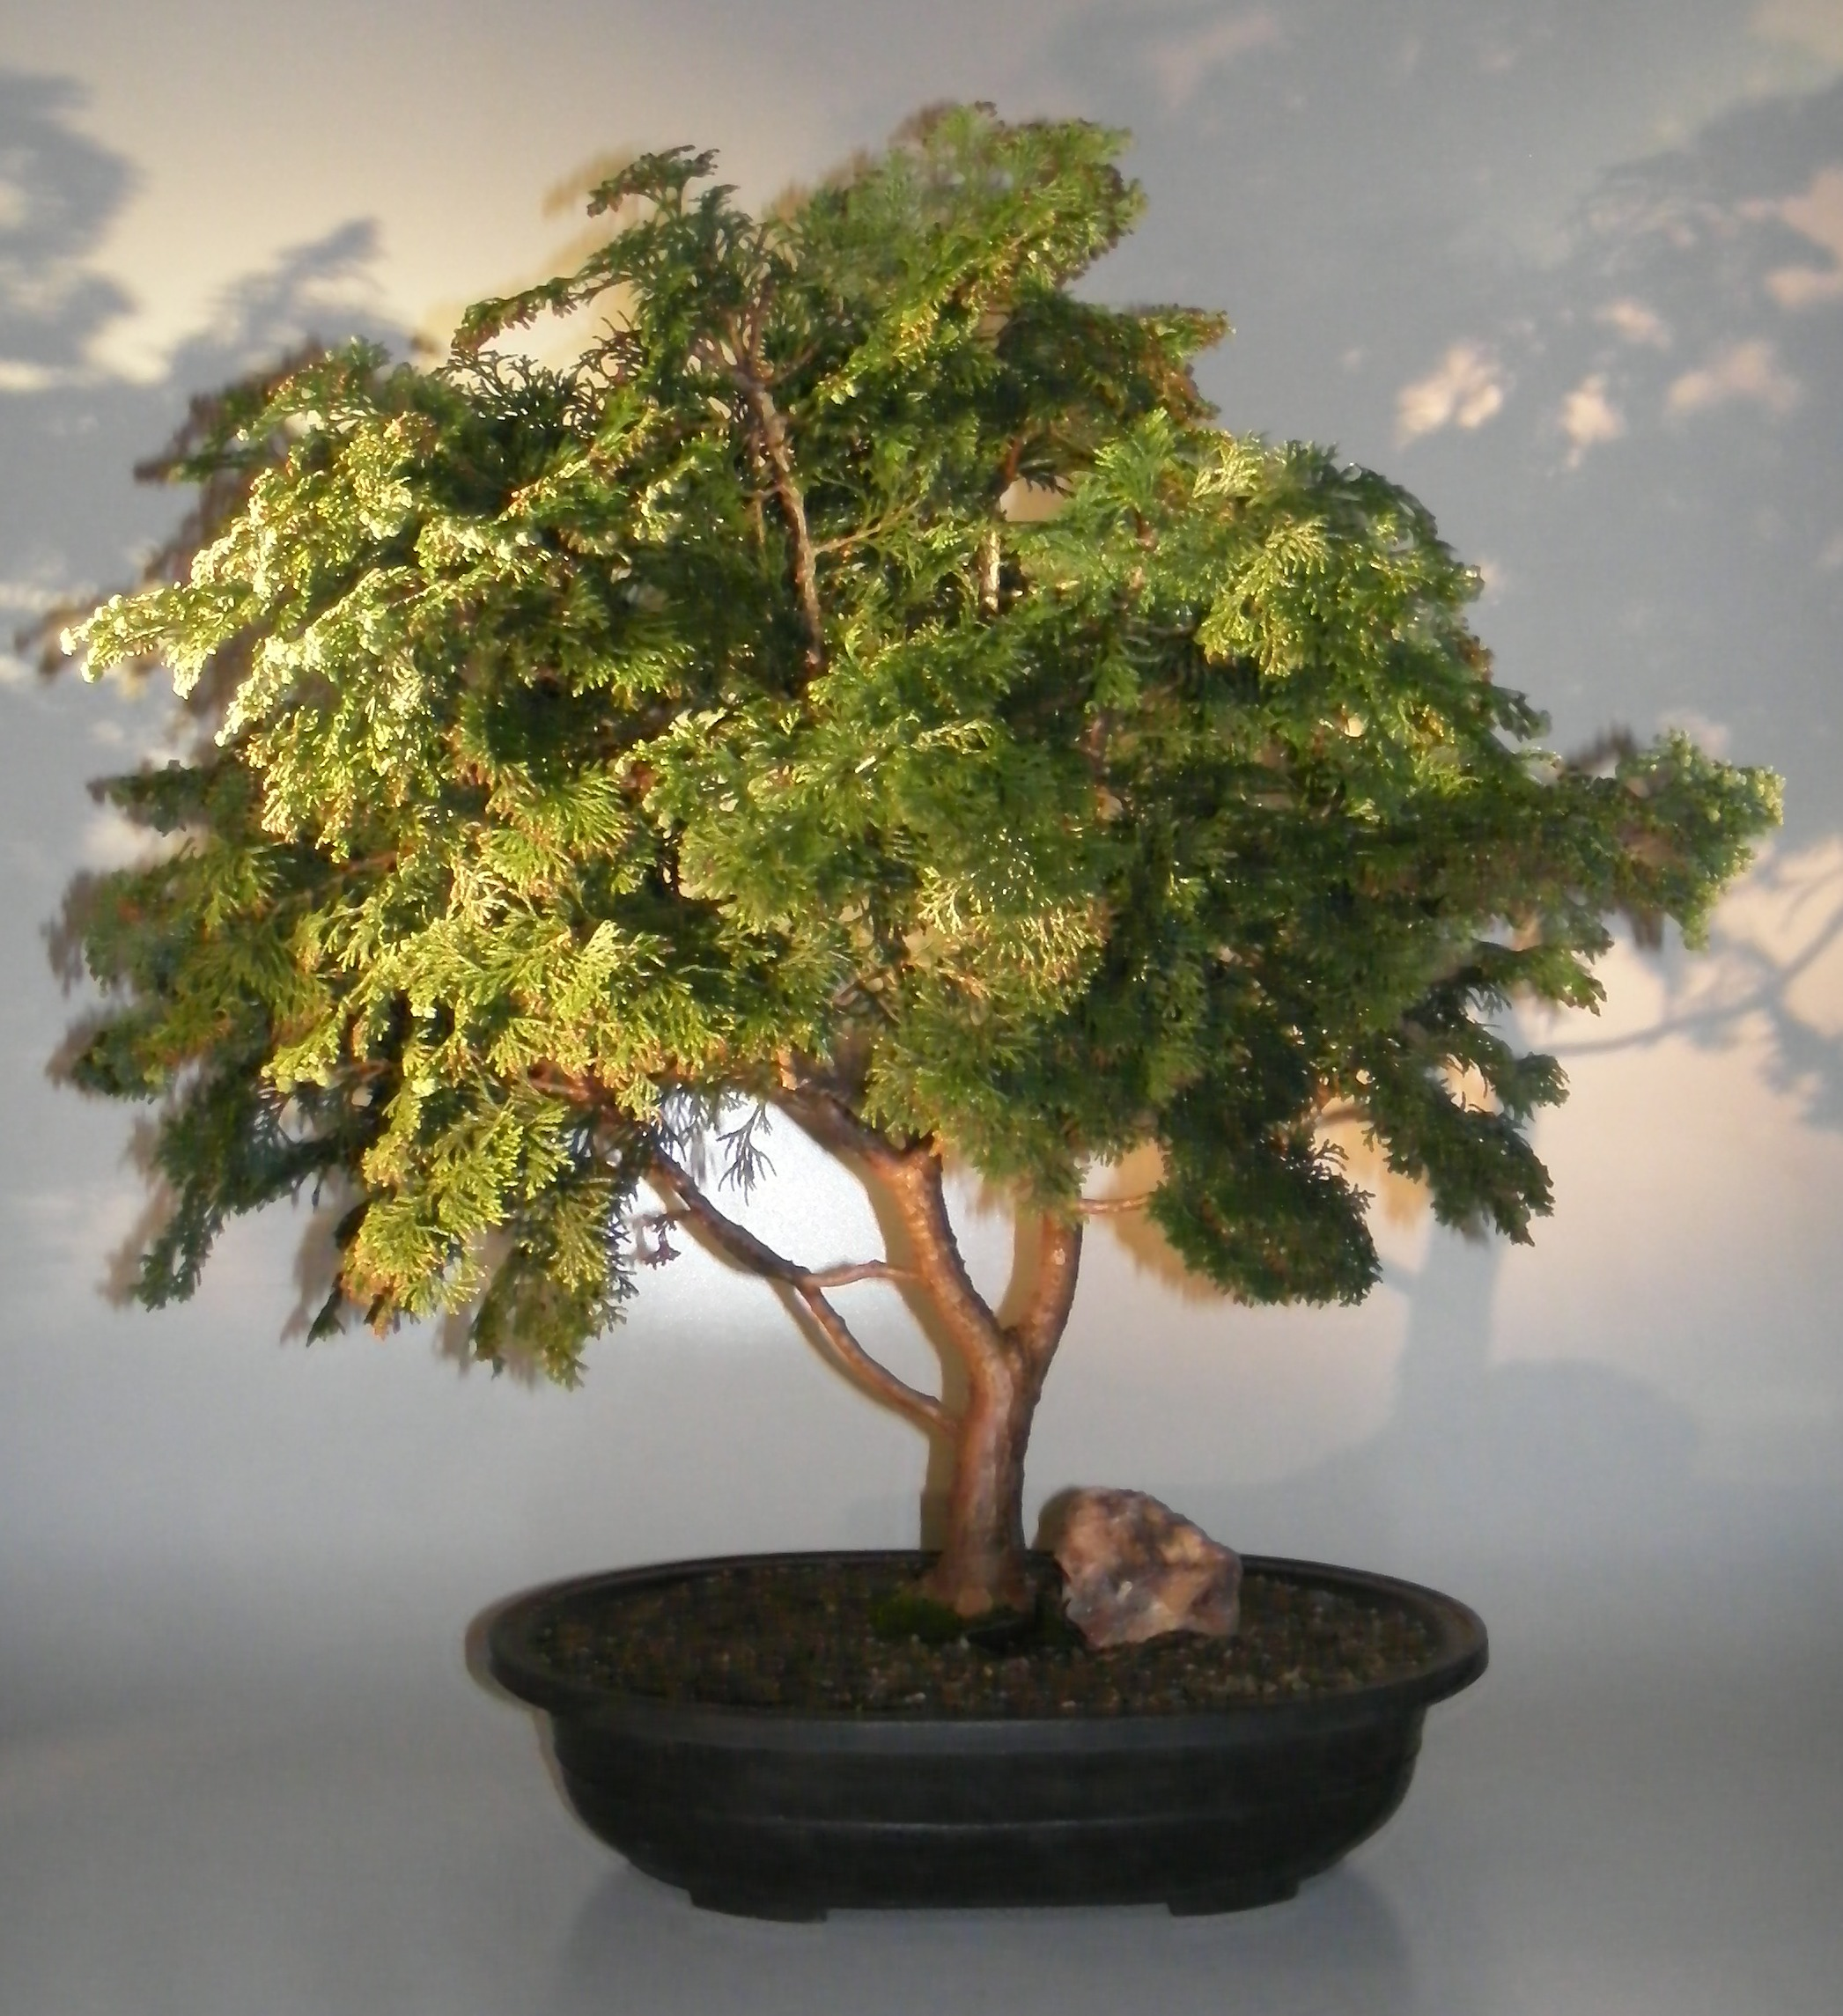 Dwarf Hinoki Cypress Bonsai Tree Obtusa Compressa Nana